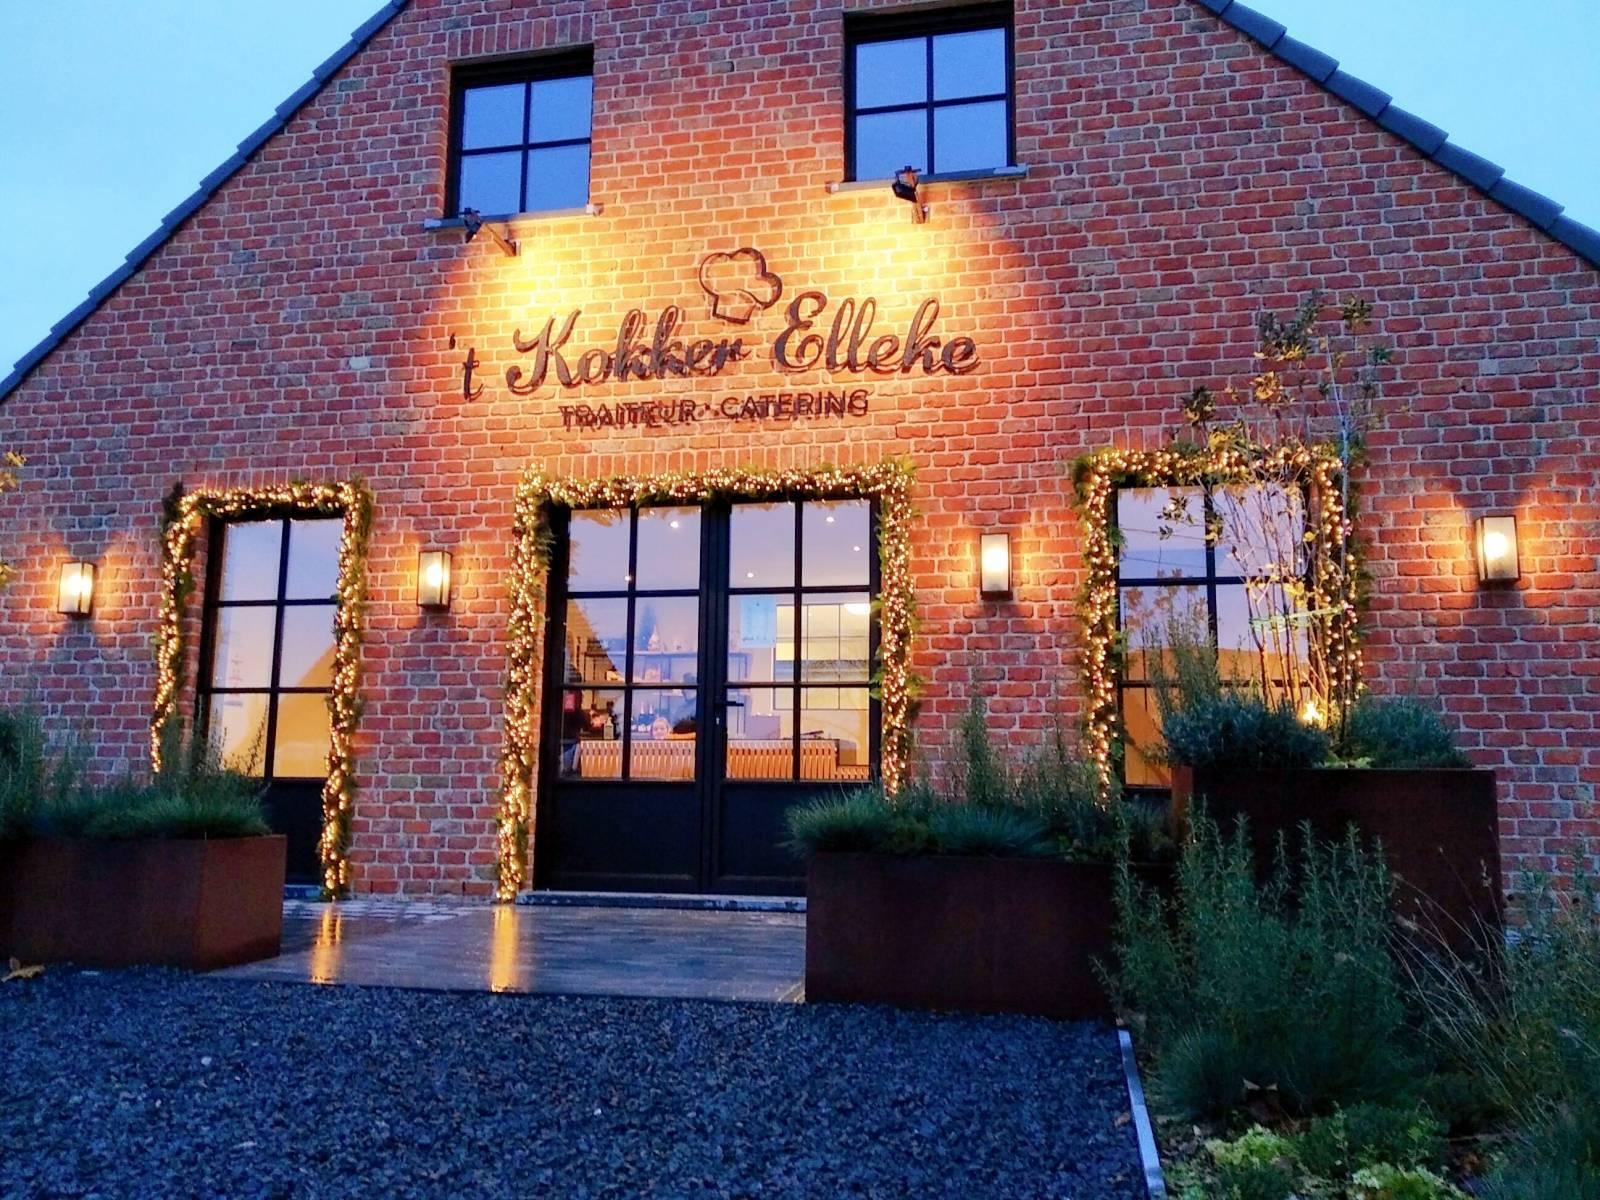 'T Kokkerelleke - Catering - House Of Weddings - 7